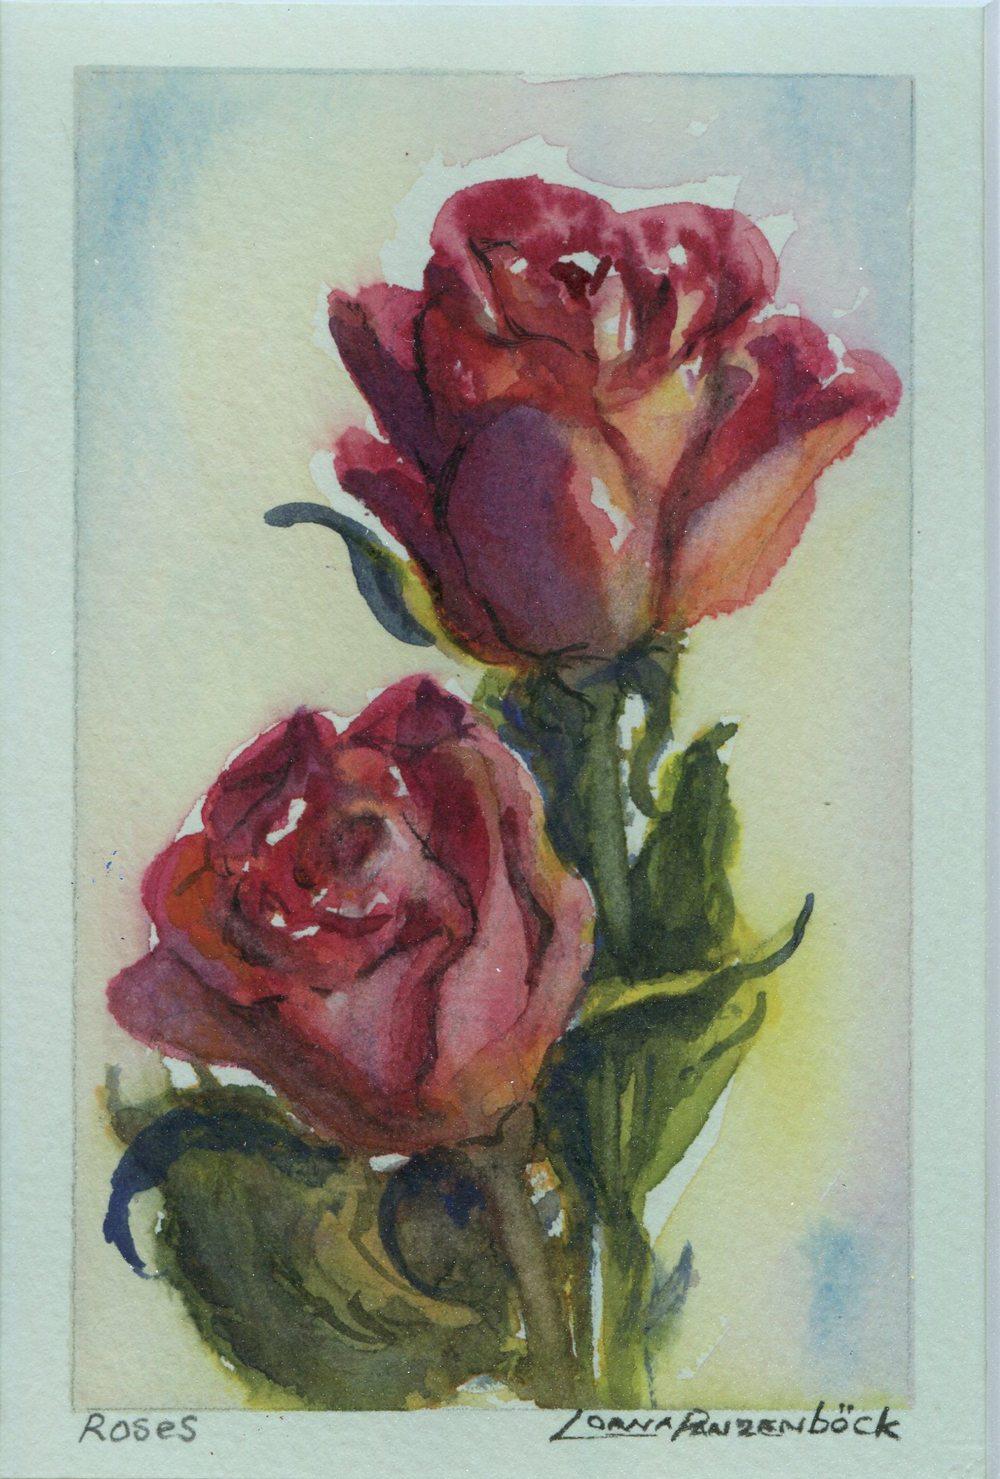 Panzenbock, Lorna 85 Roses, Water-colour